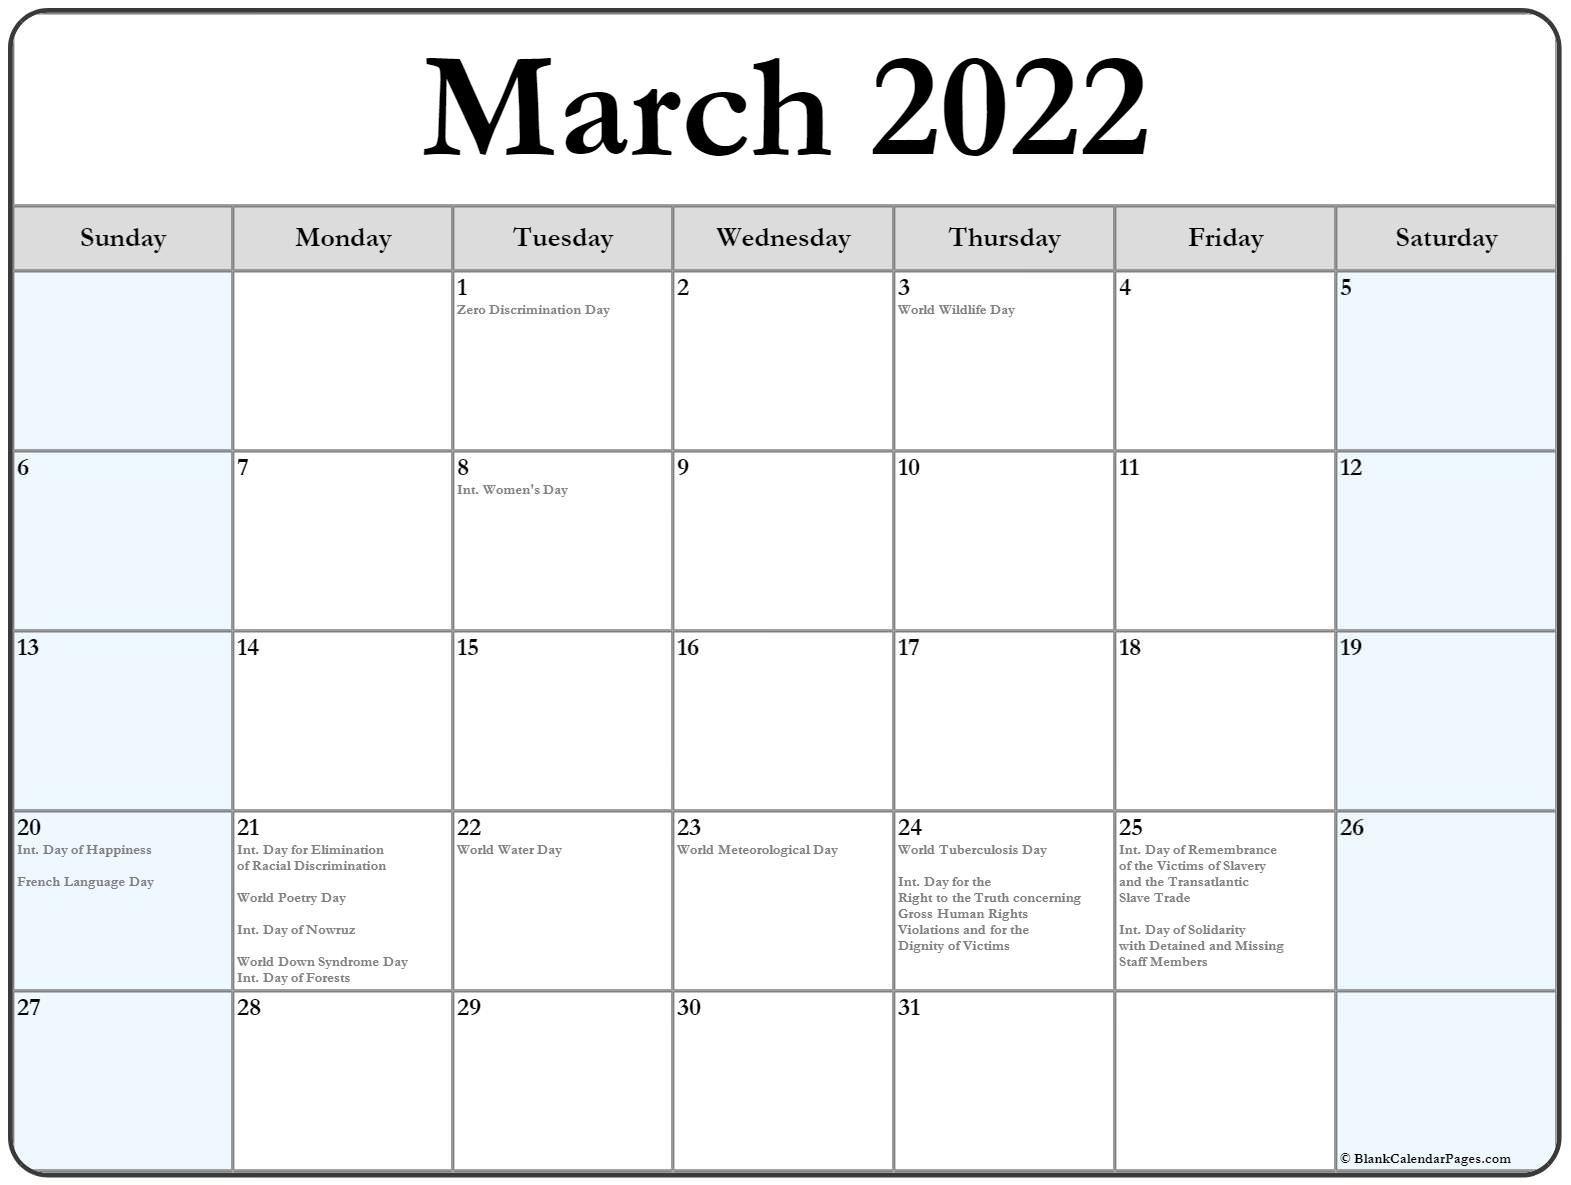 March 2022 Calendar With Holidays inside March April 2022 Printable Calendar Photo